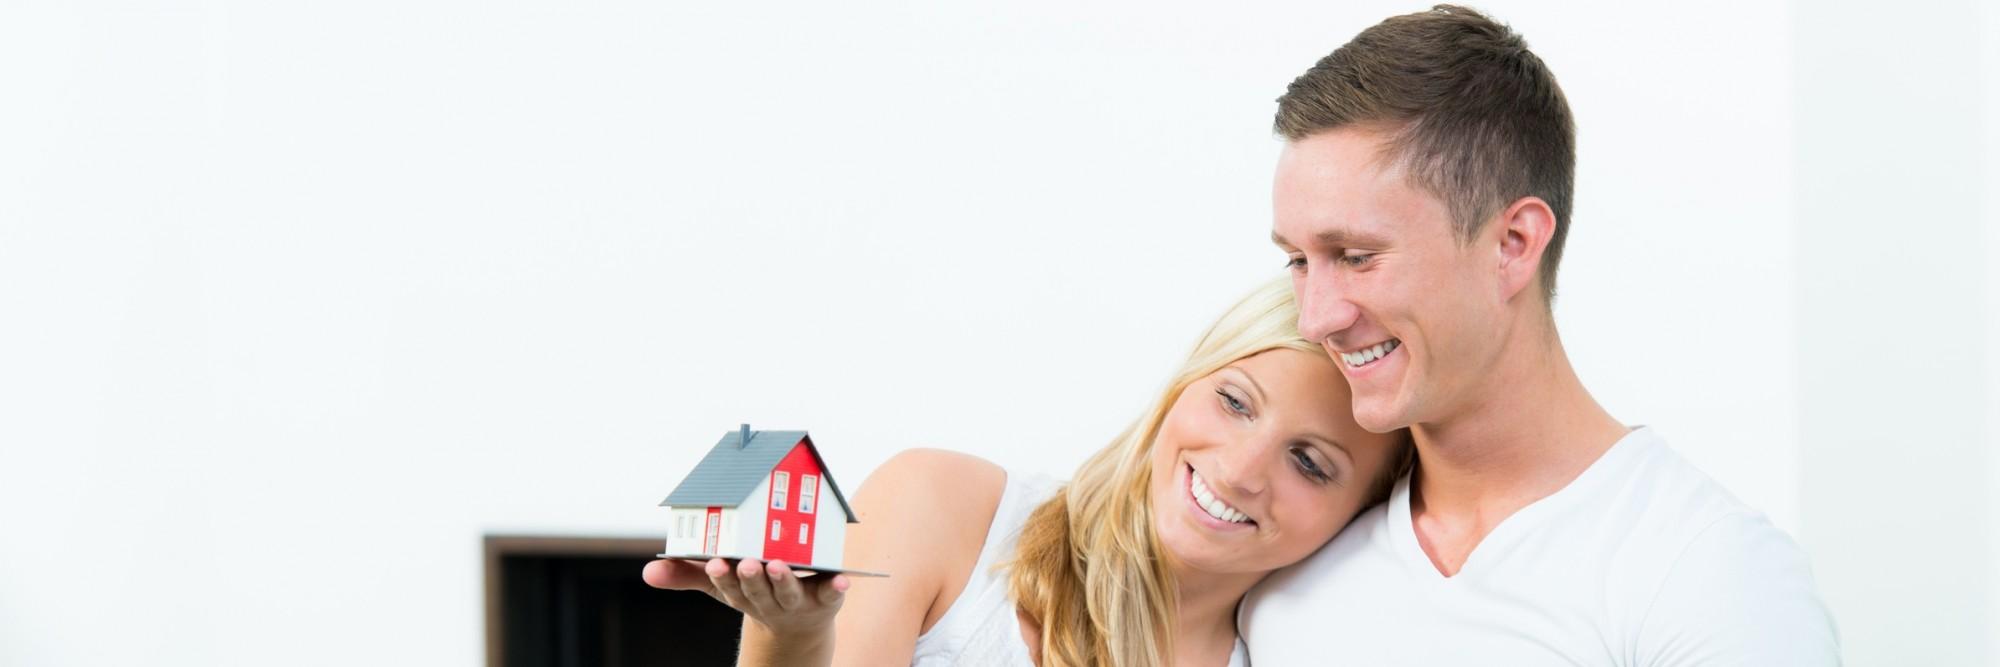 Comparador seguro de hogar